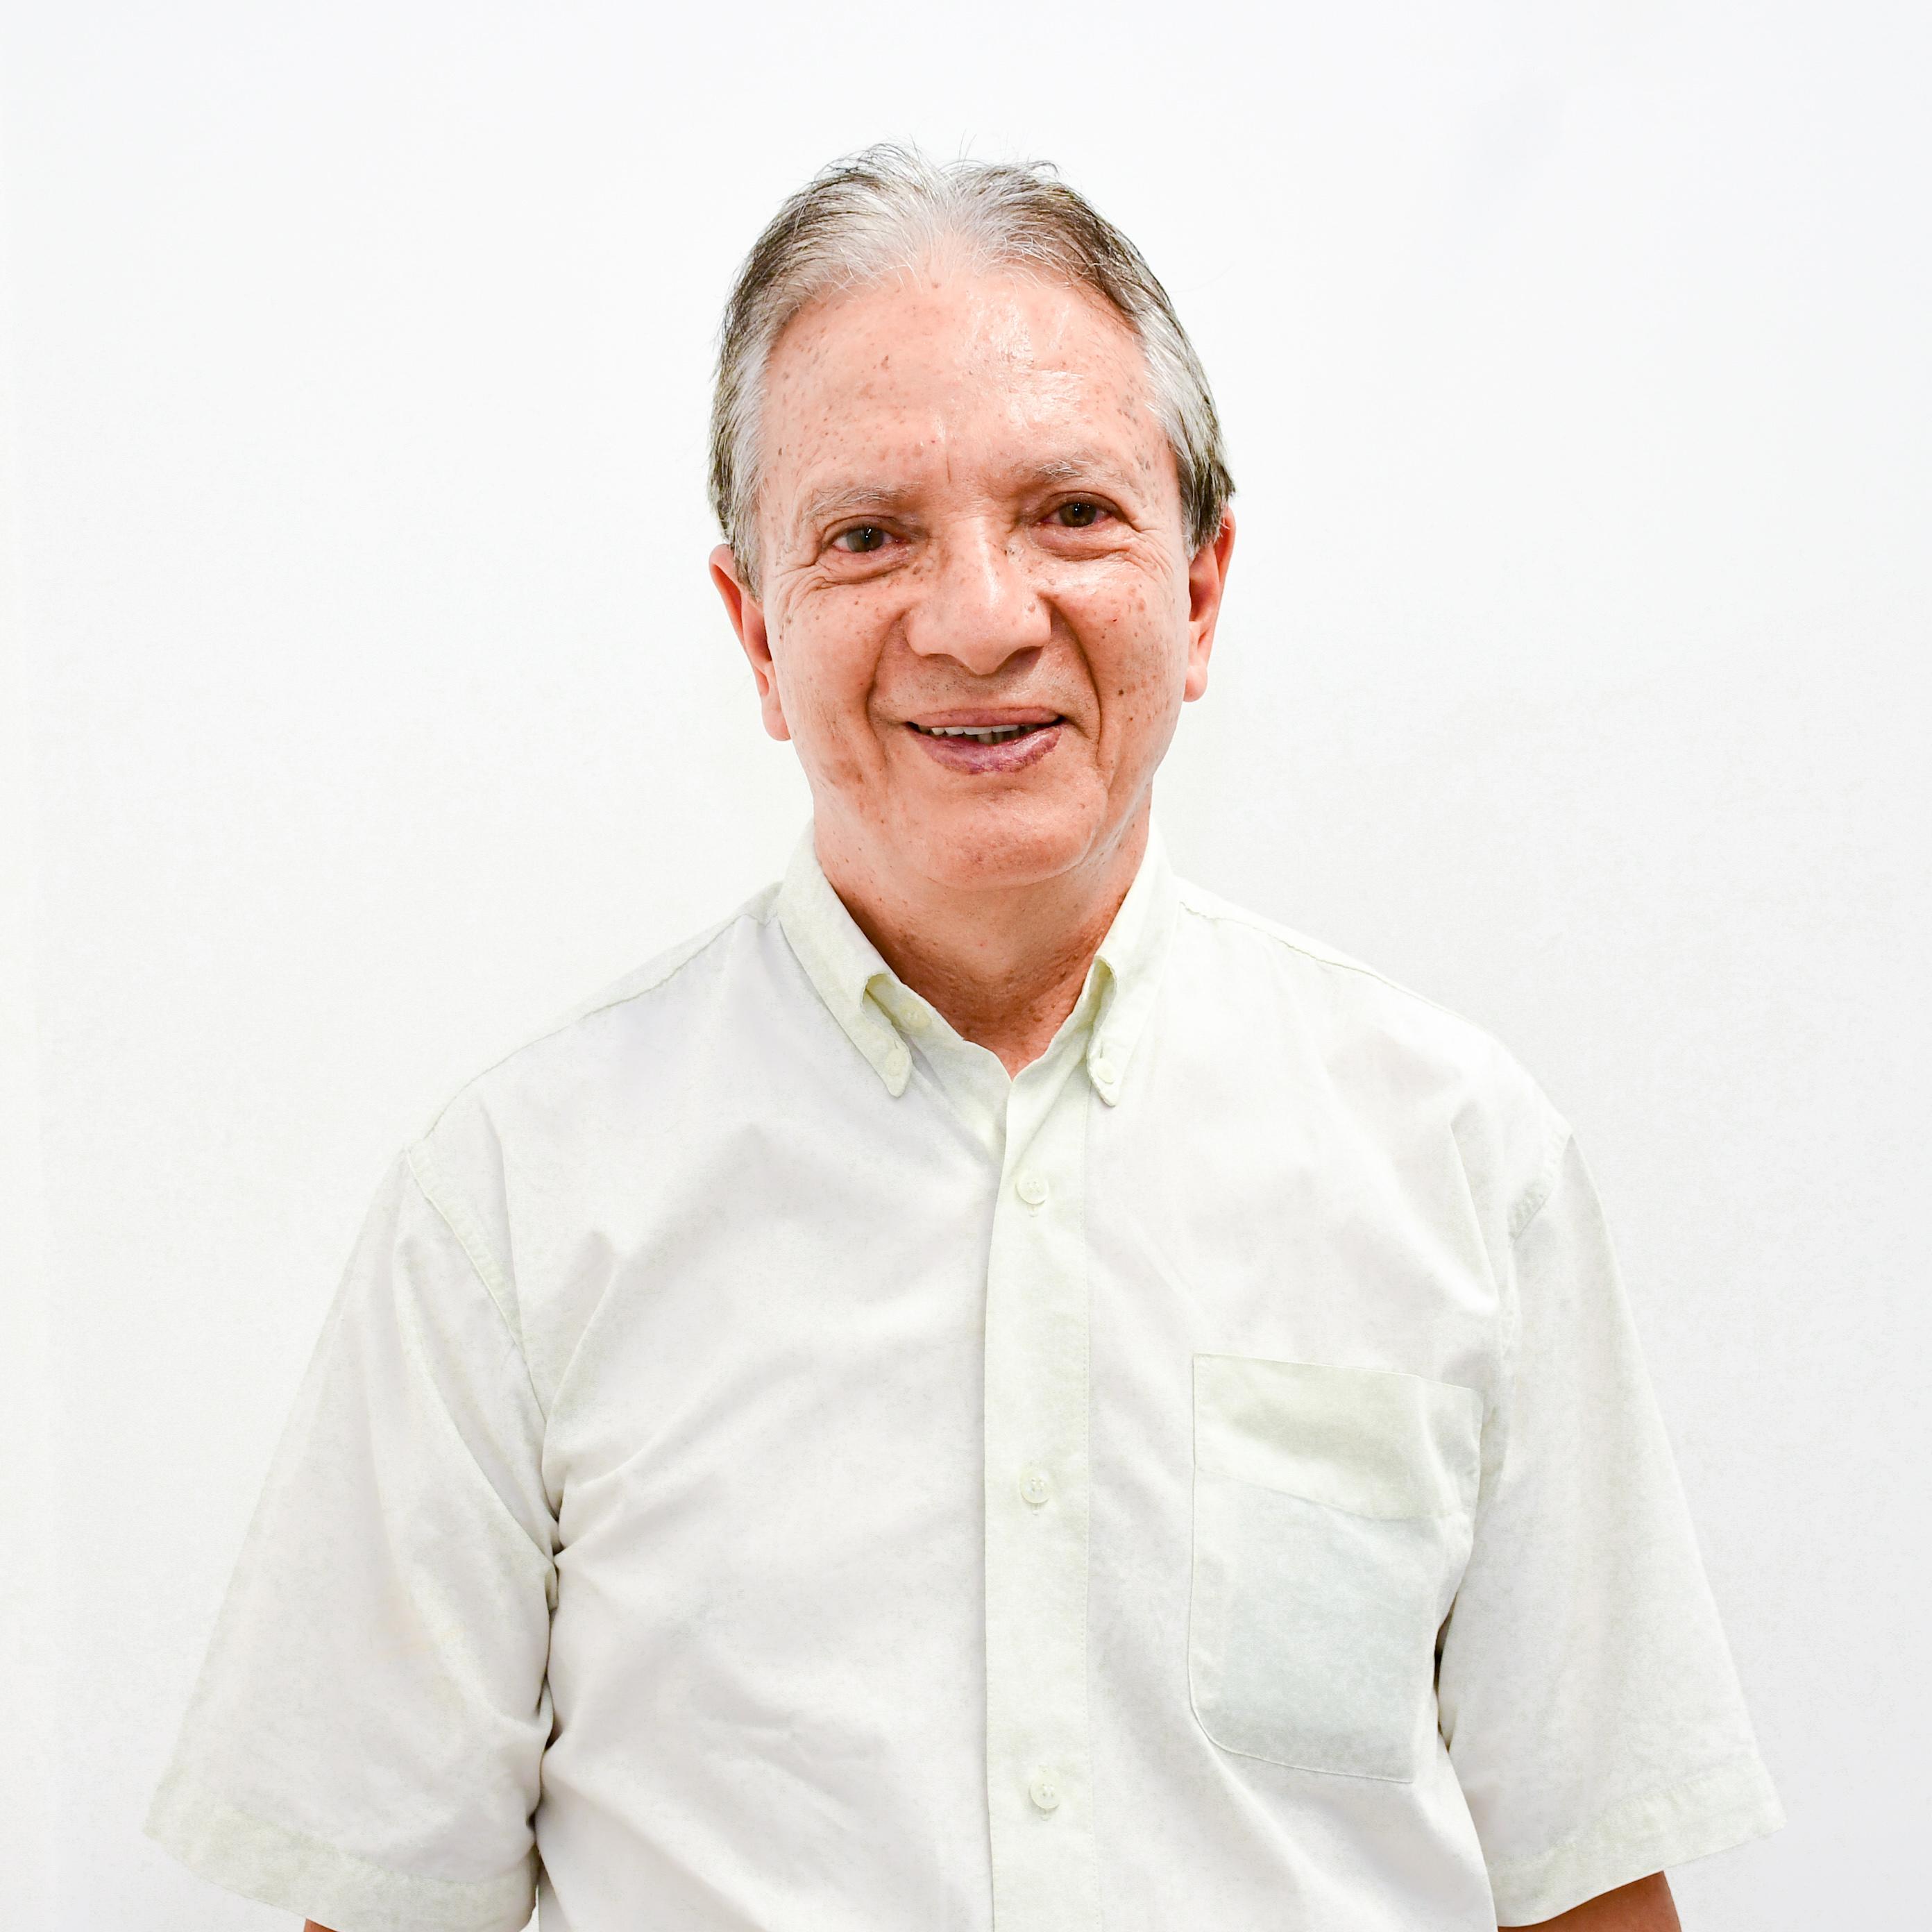 Luiz Euribel Prestes Carneiro